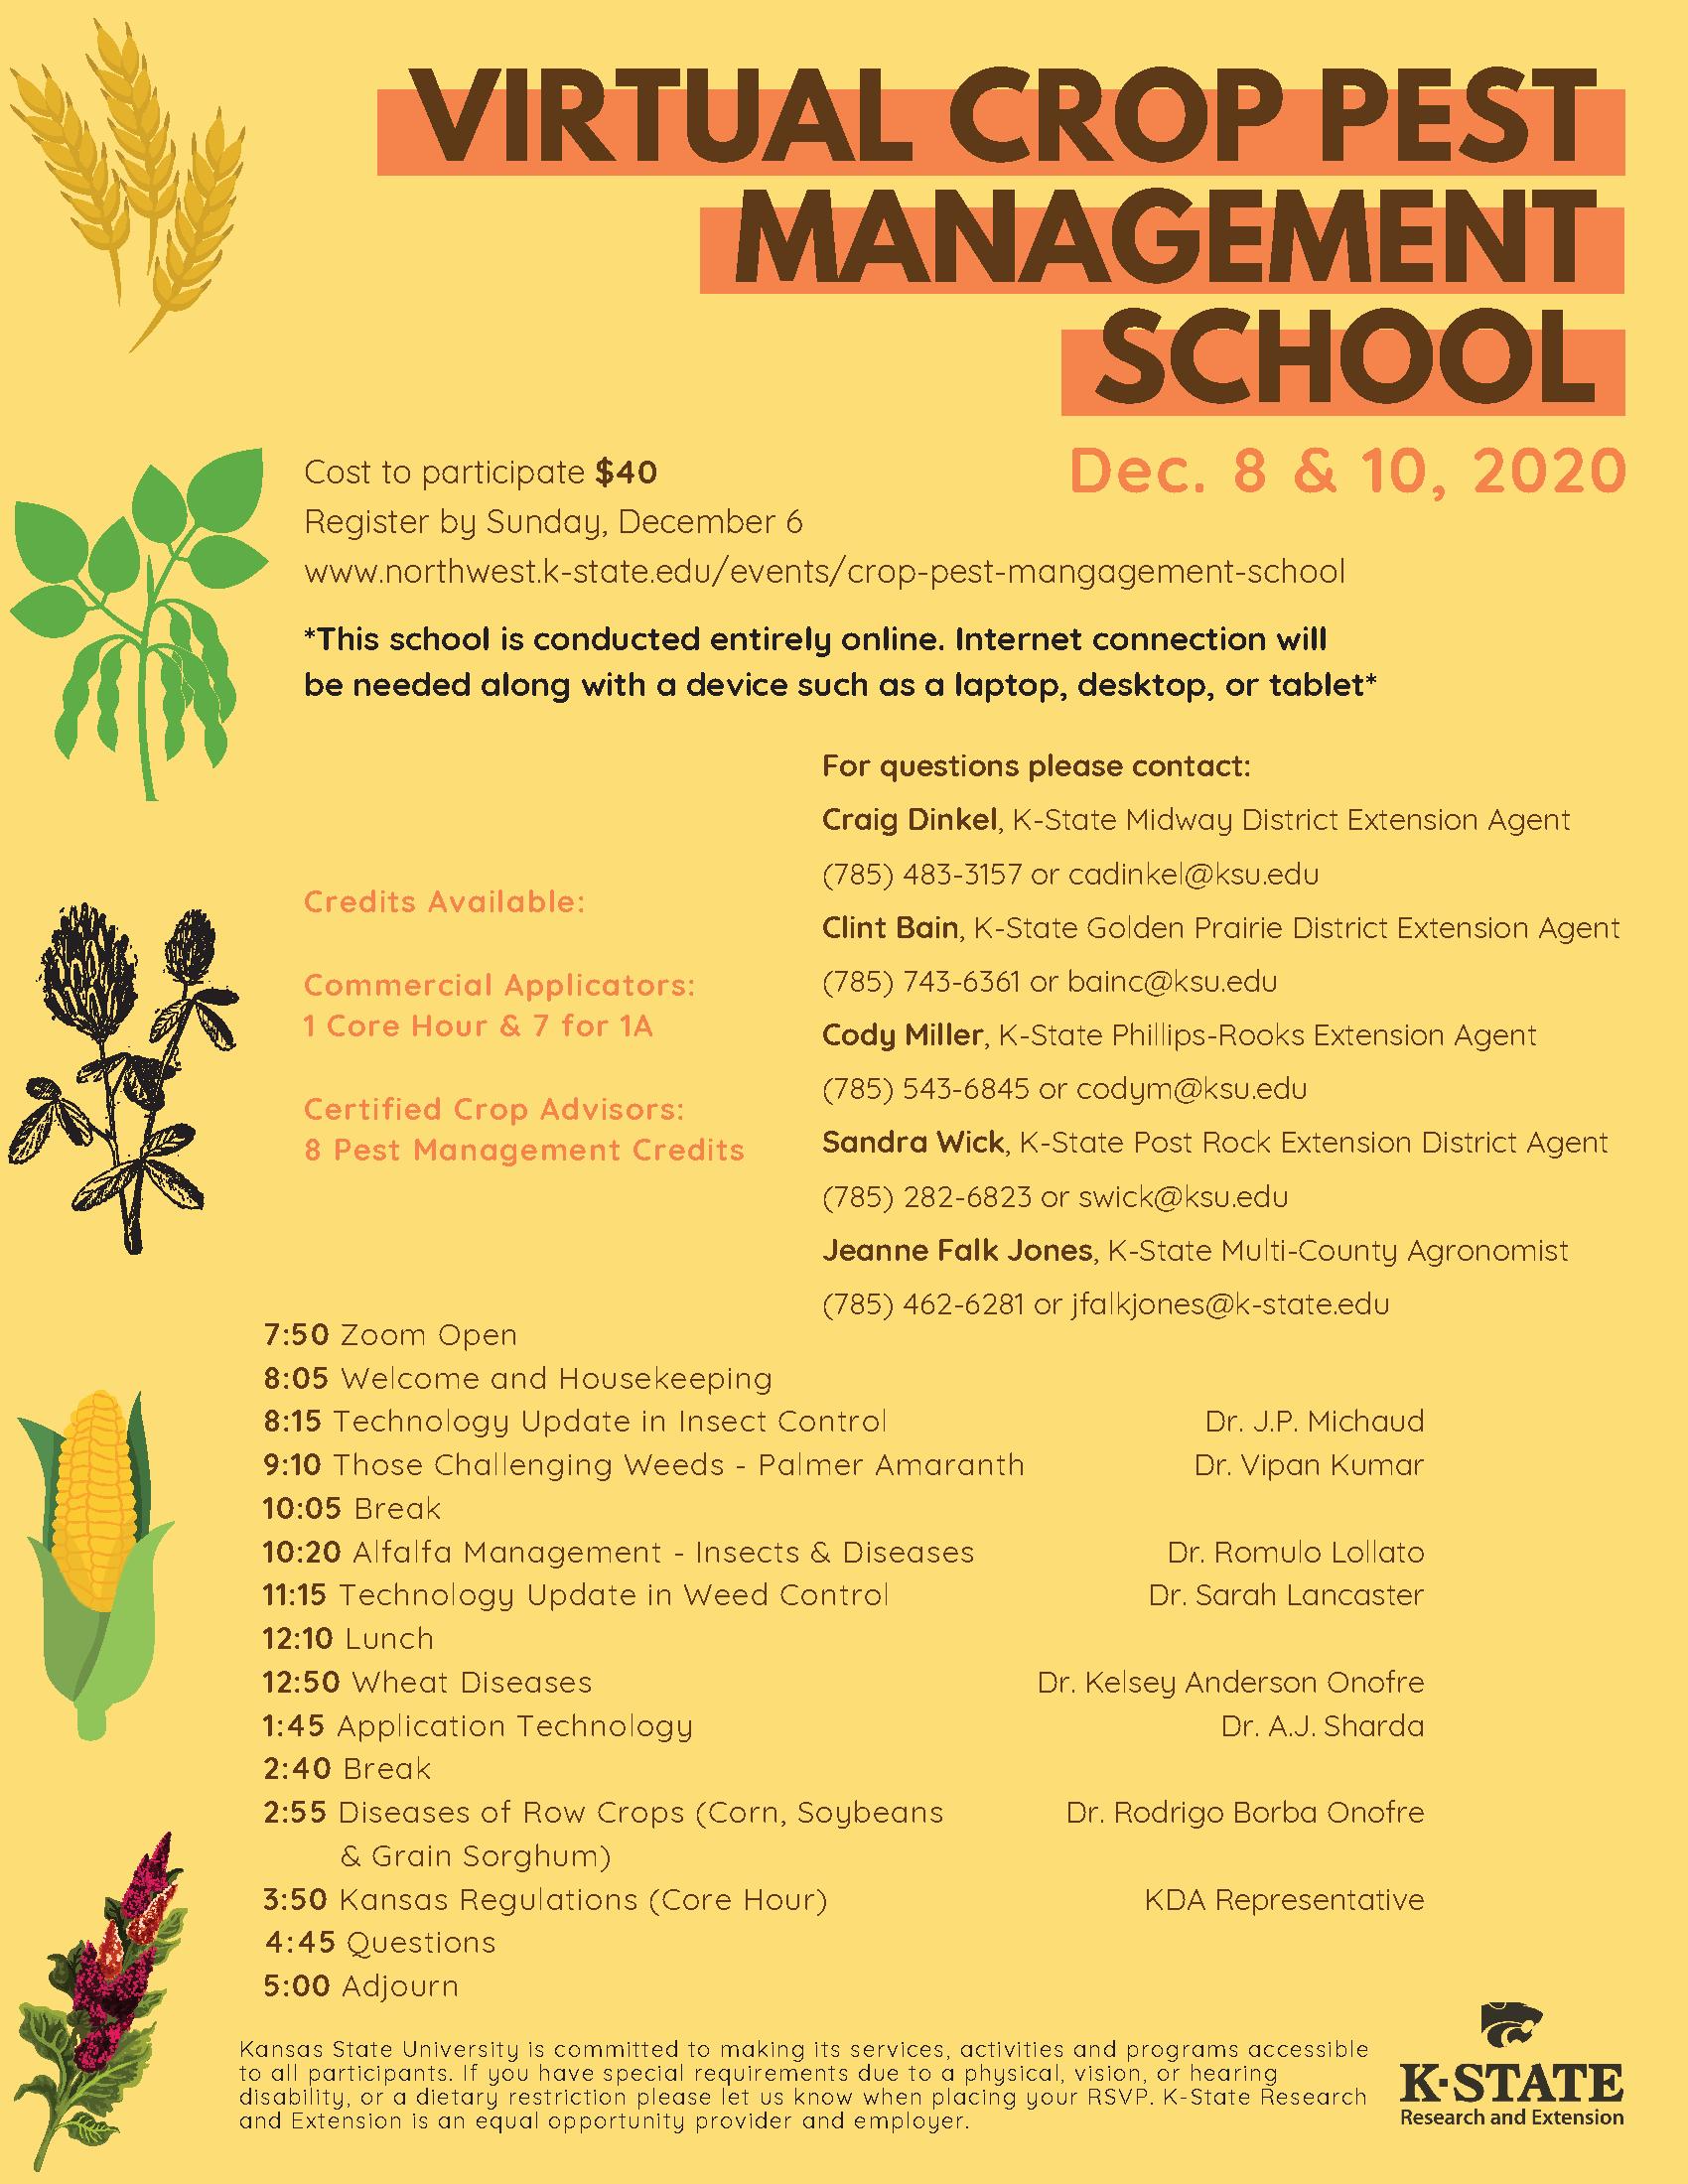 Virtual Crop Pest School